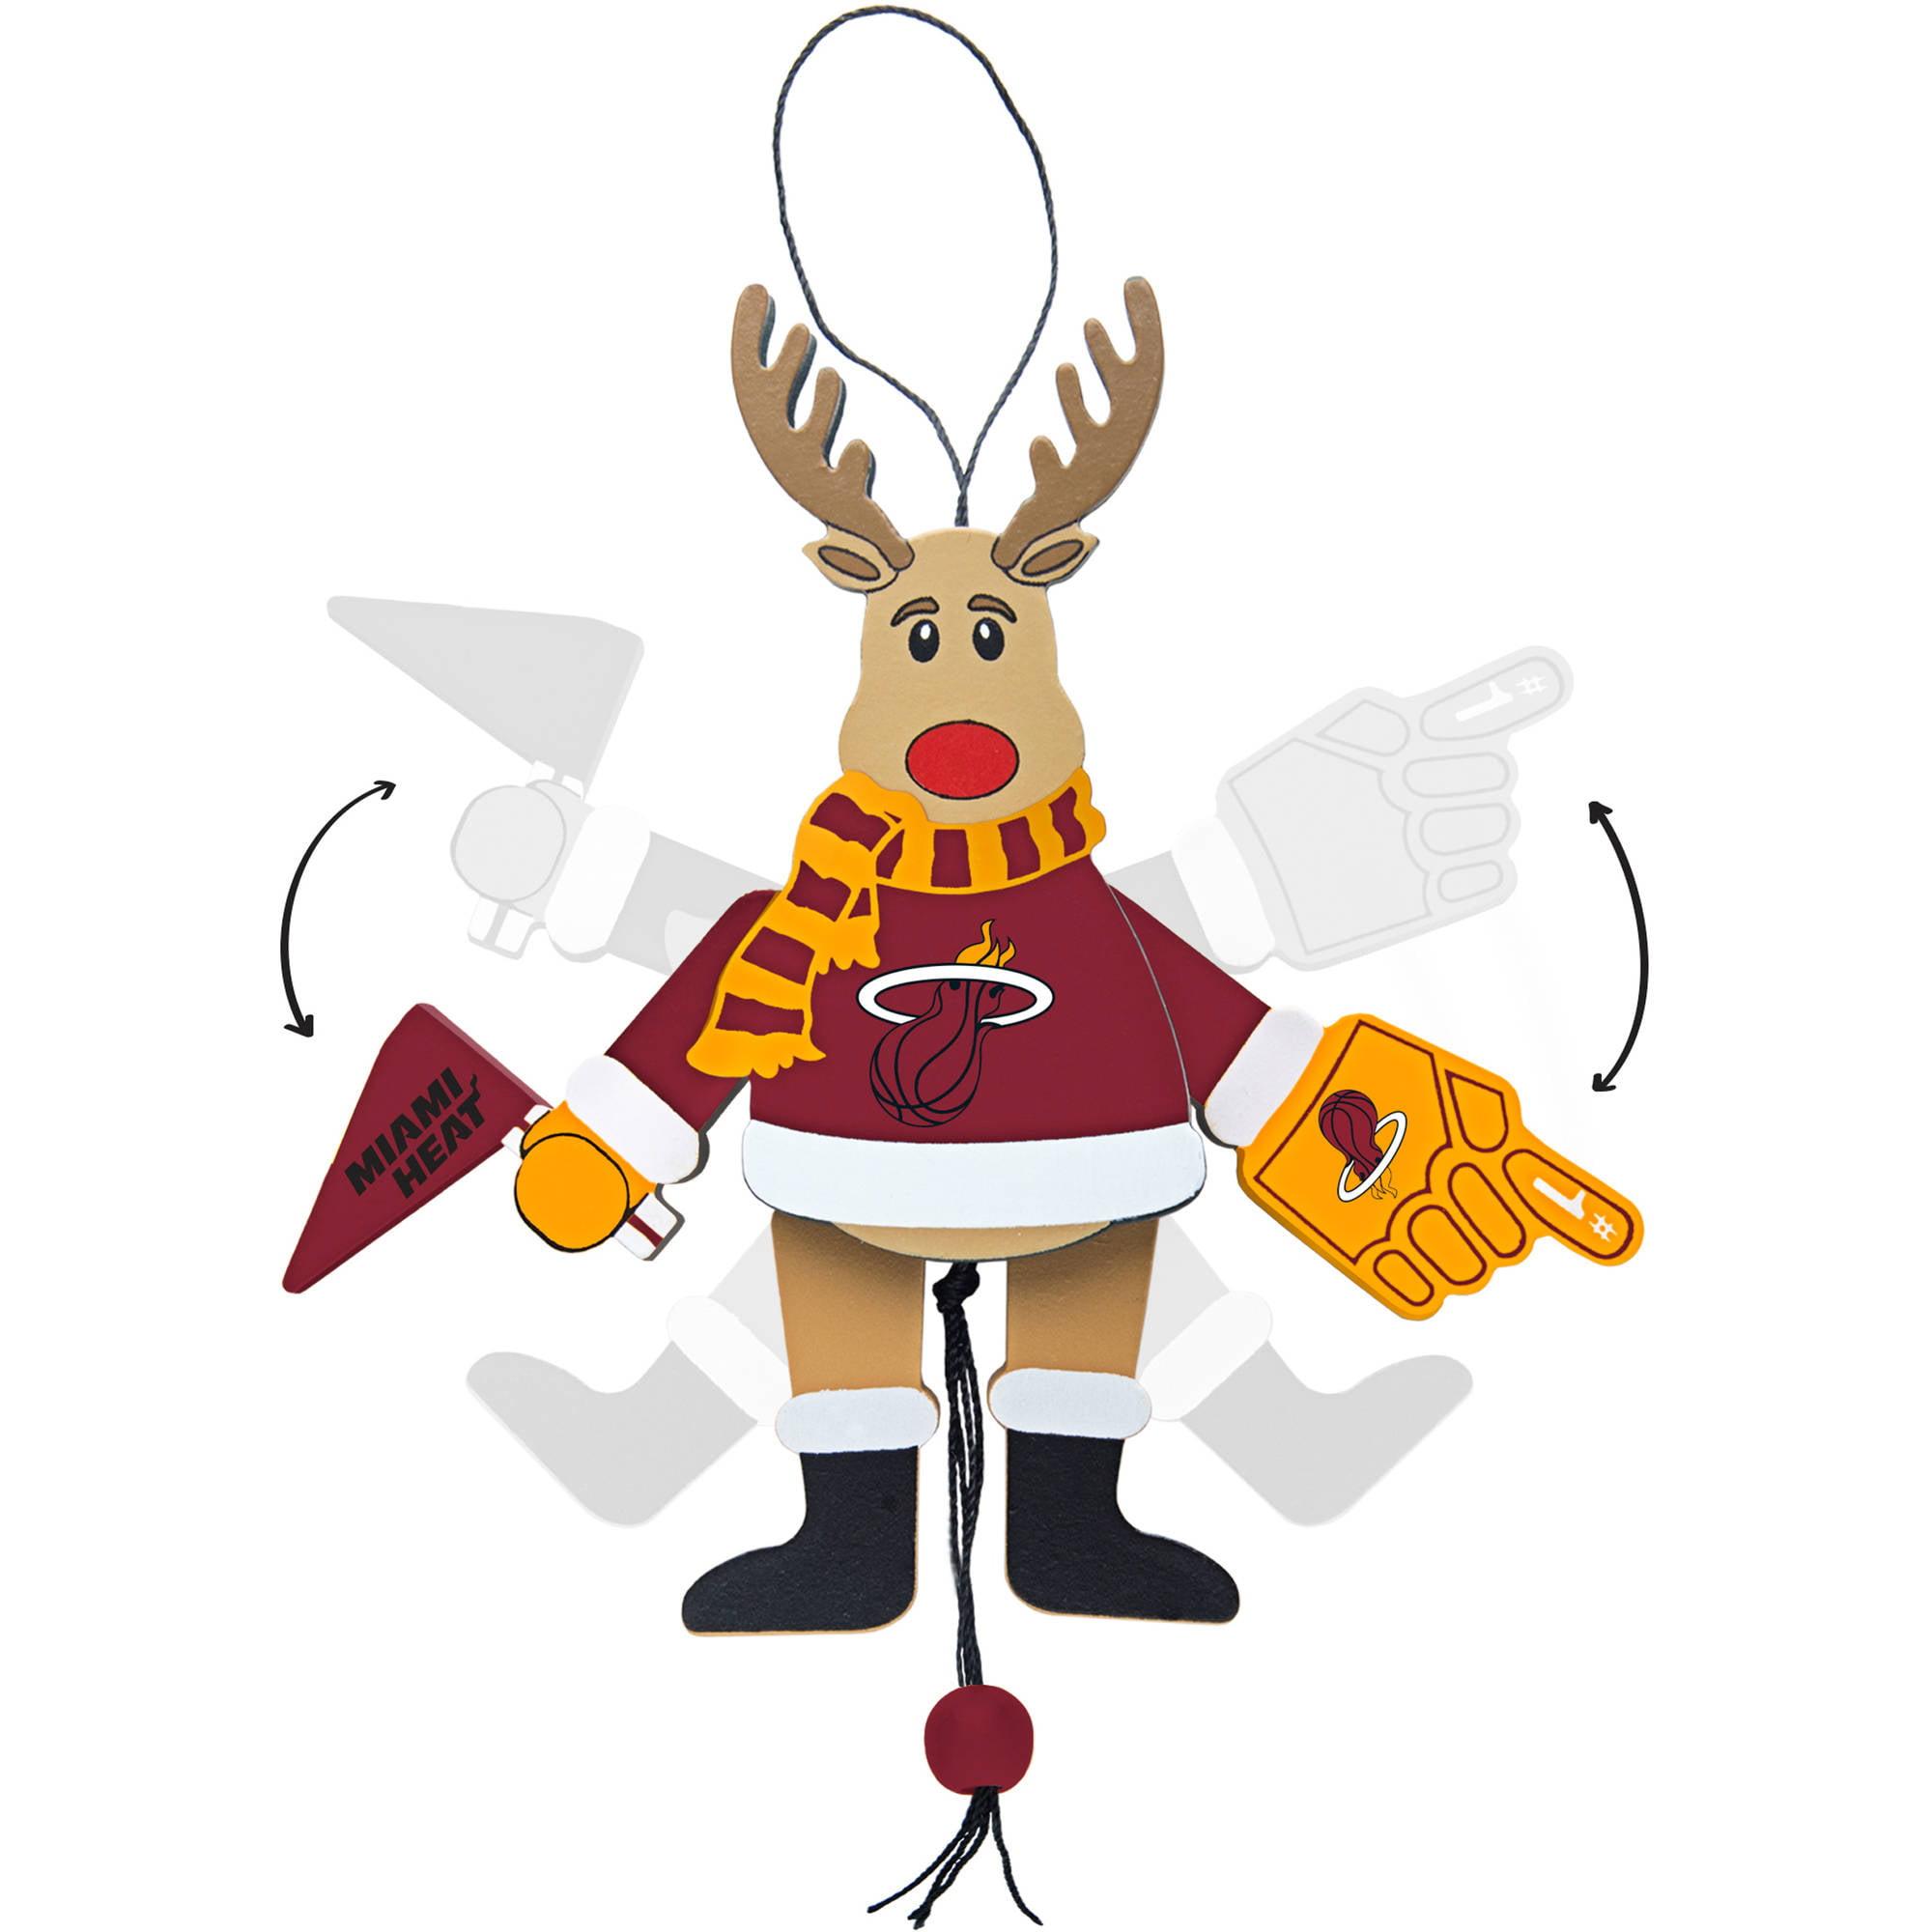 Topperscot by Boelter Brands NBA Wooden Cheering Reindeer Ornament, Miami Heat